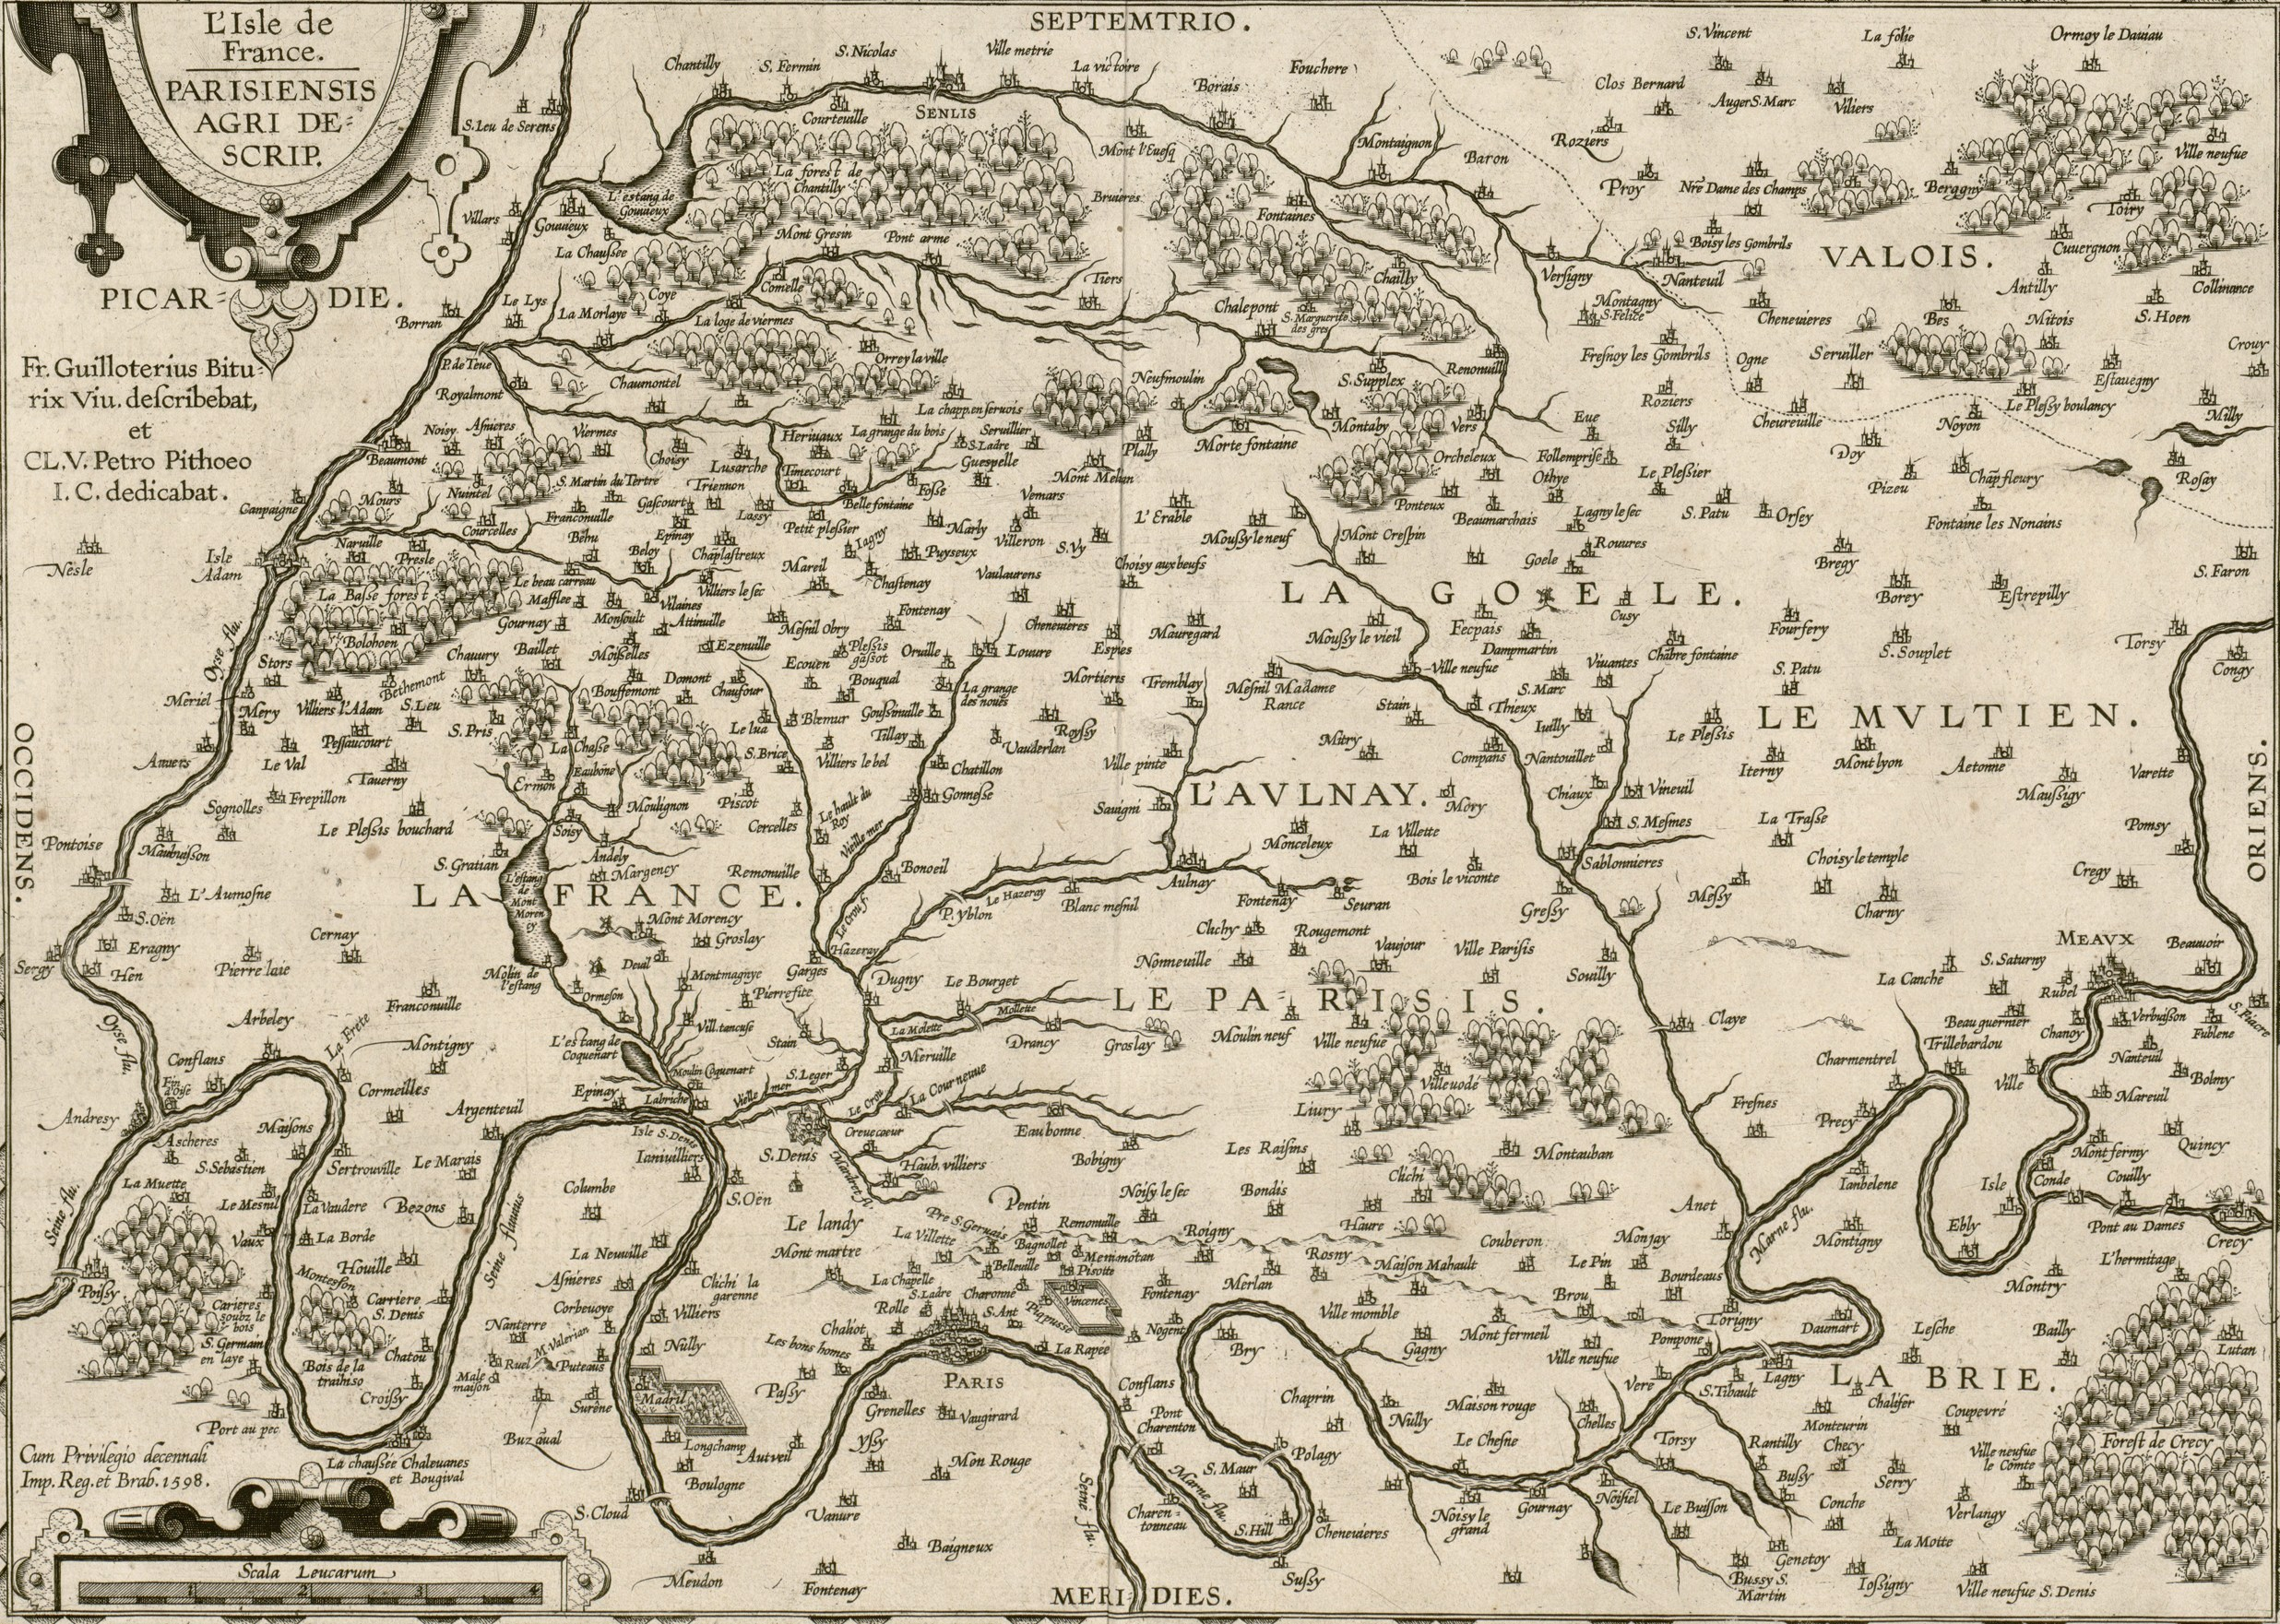 Plan de l'Isle de France en 1598.